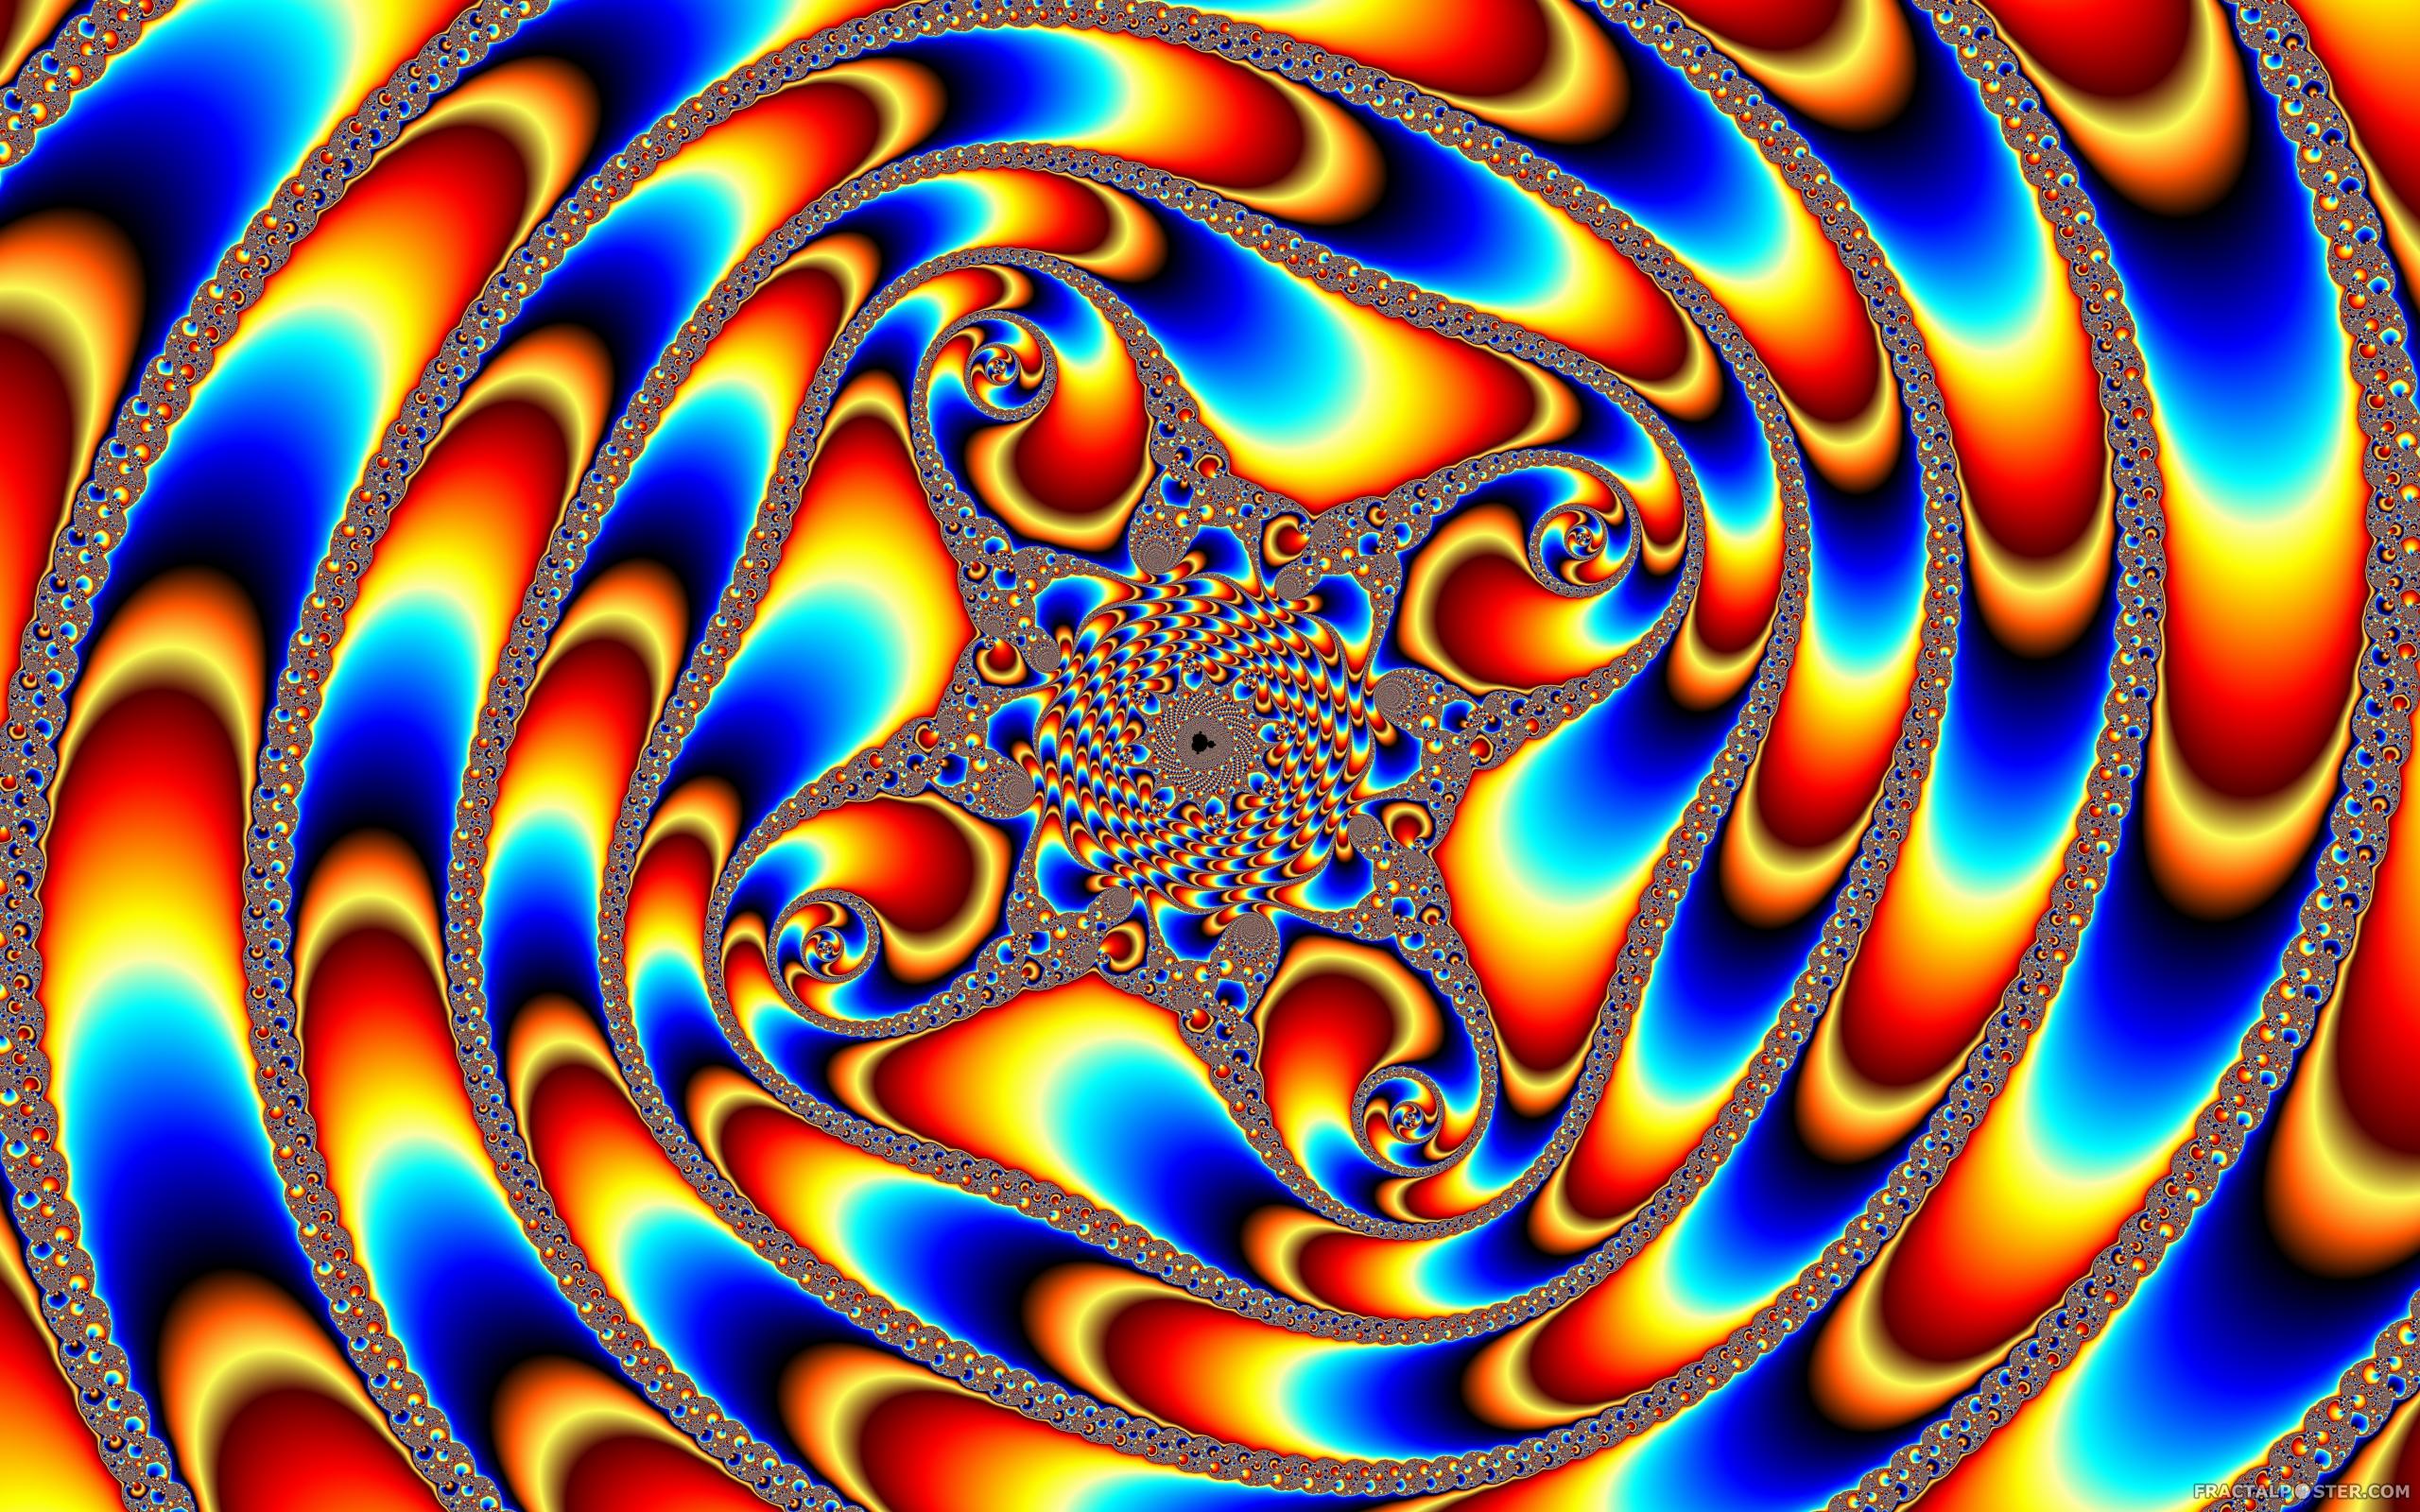 <b>Fractal</b> star [2] <b>wallpaper</b> - Abstract <b>wallpapers</b> - #43336